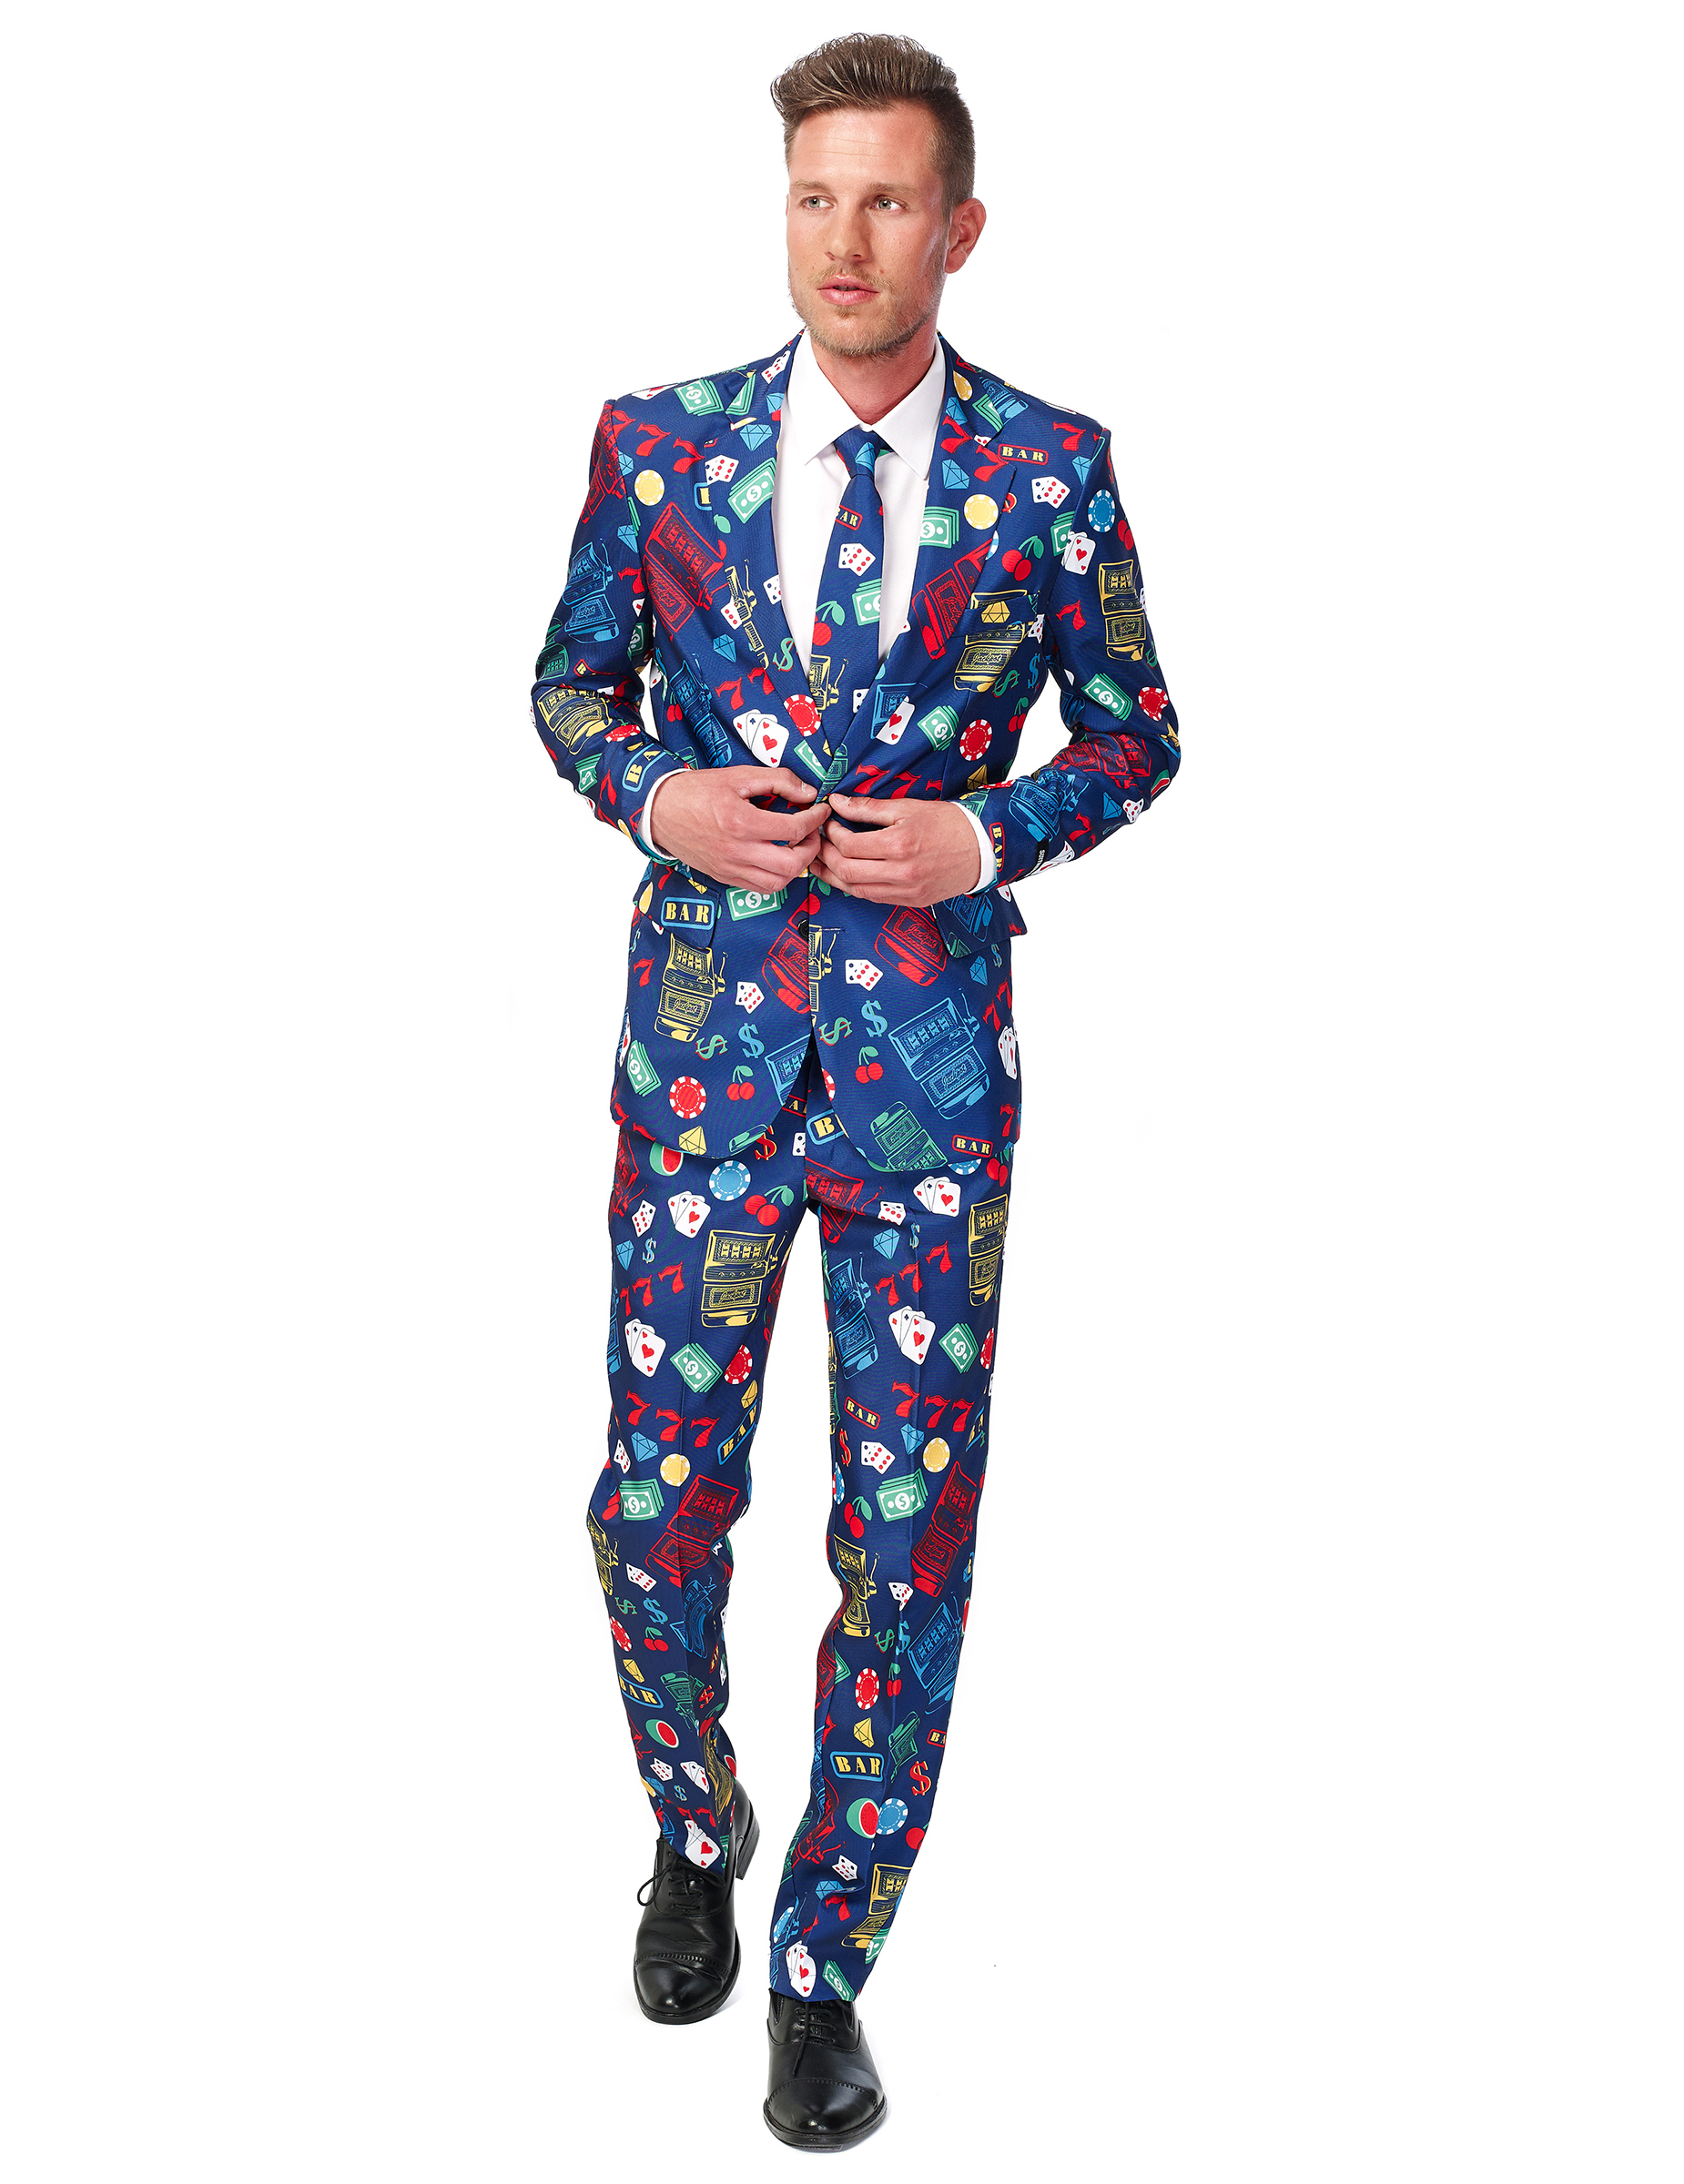 Connu Costume Mr. Casino homme Suitmeister™ : Deguise-toi, achat de  YQ67